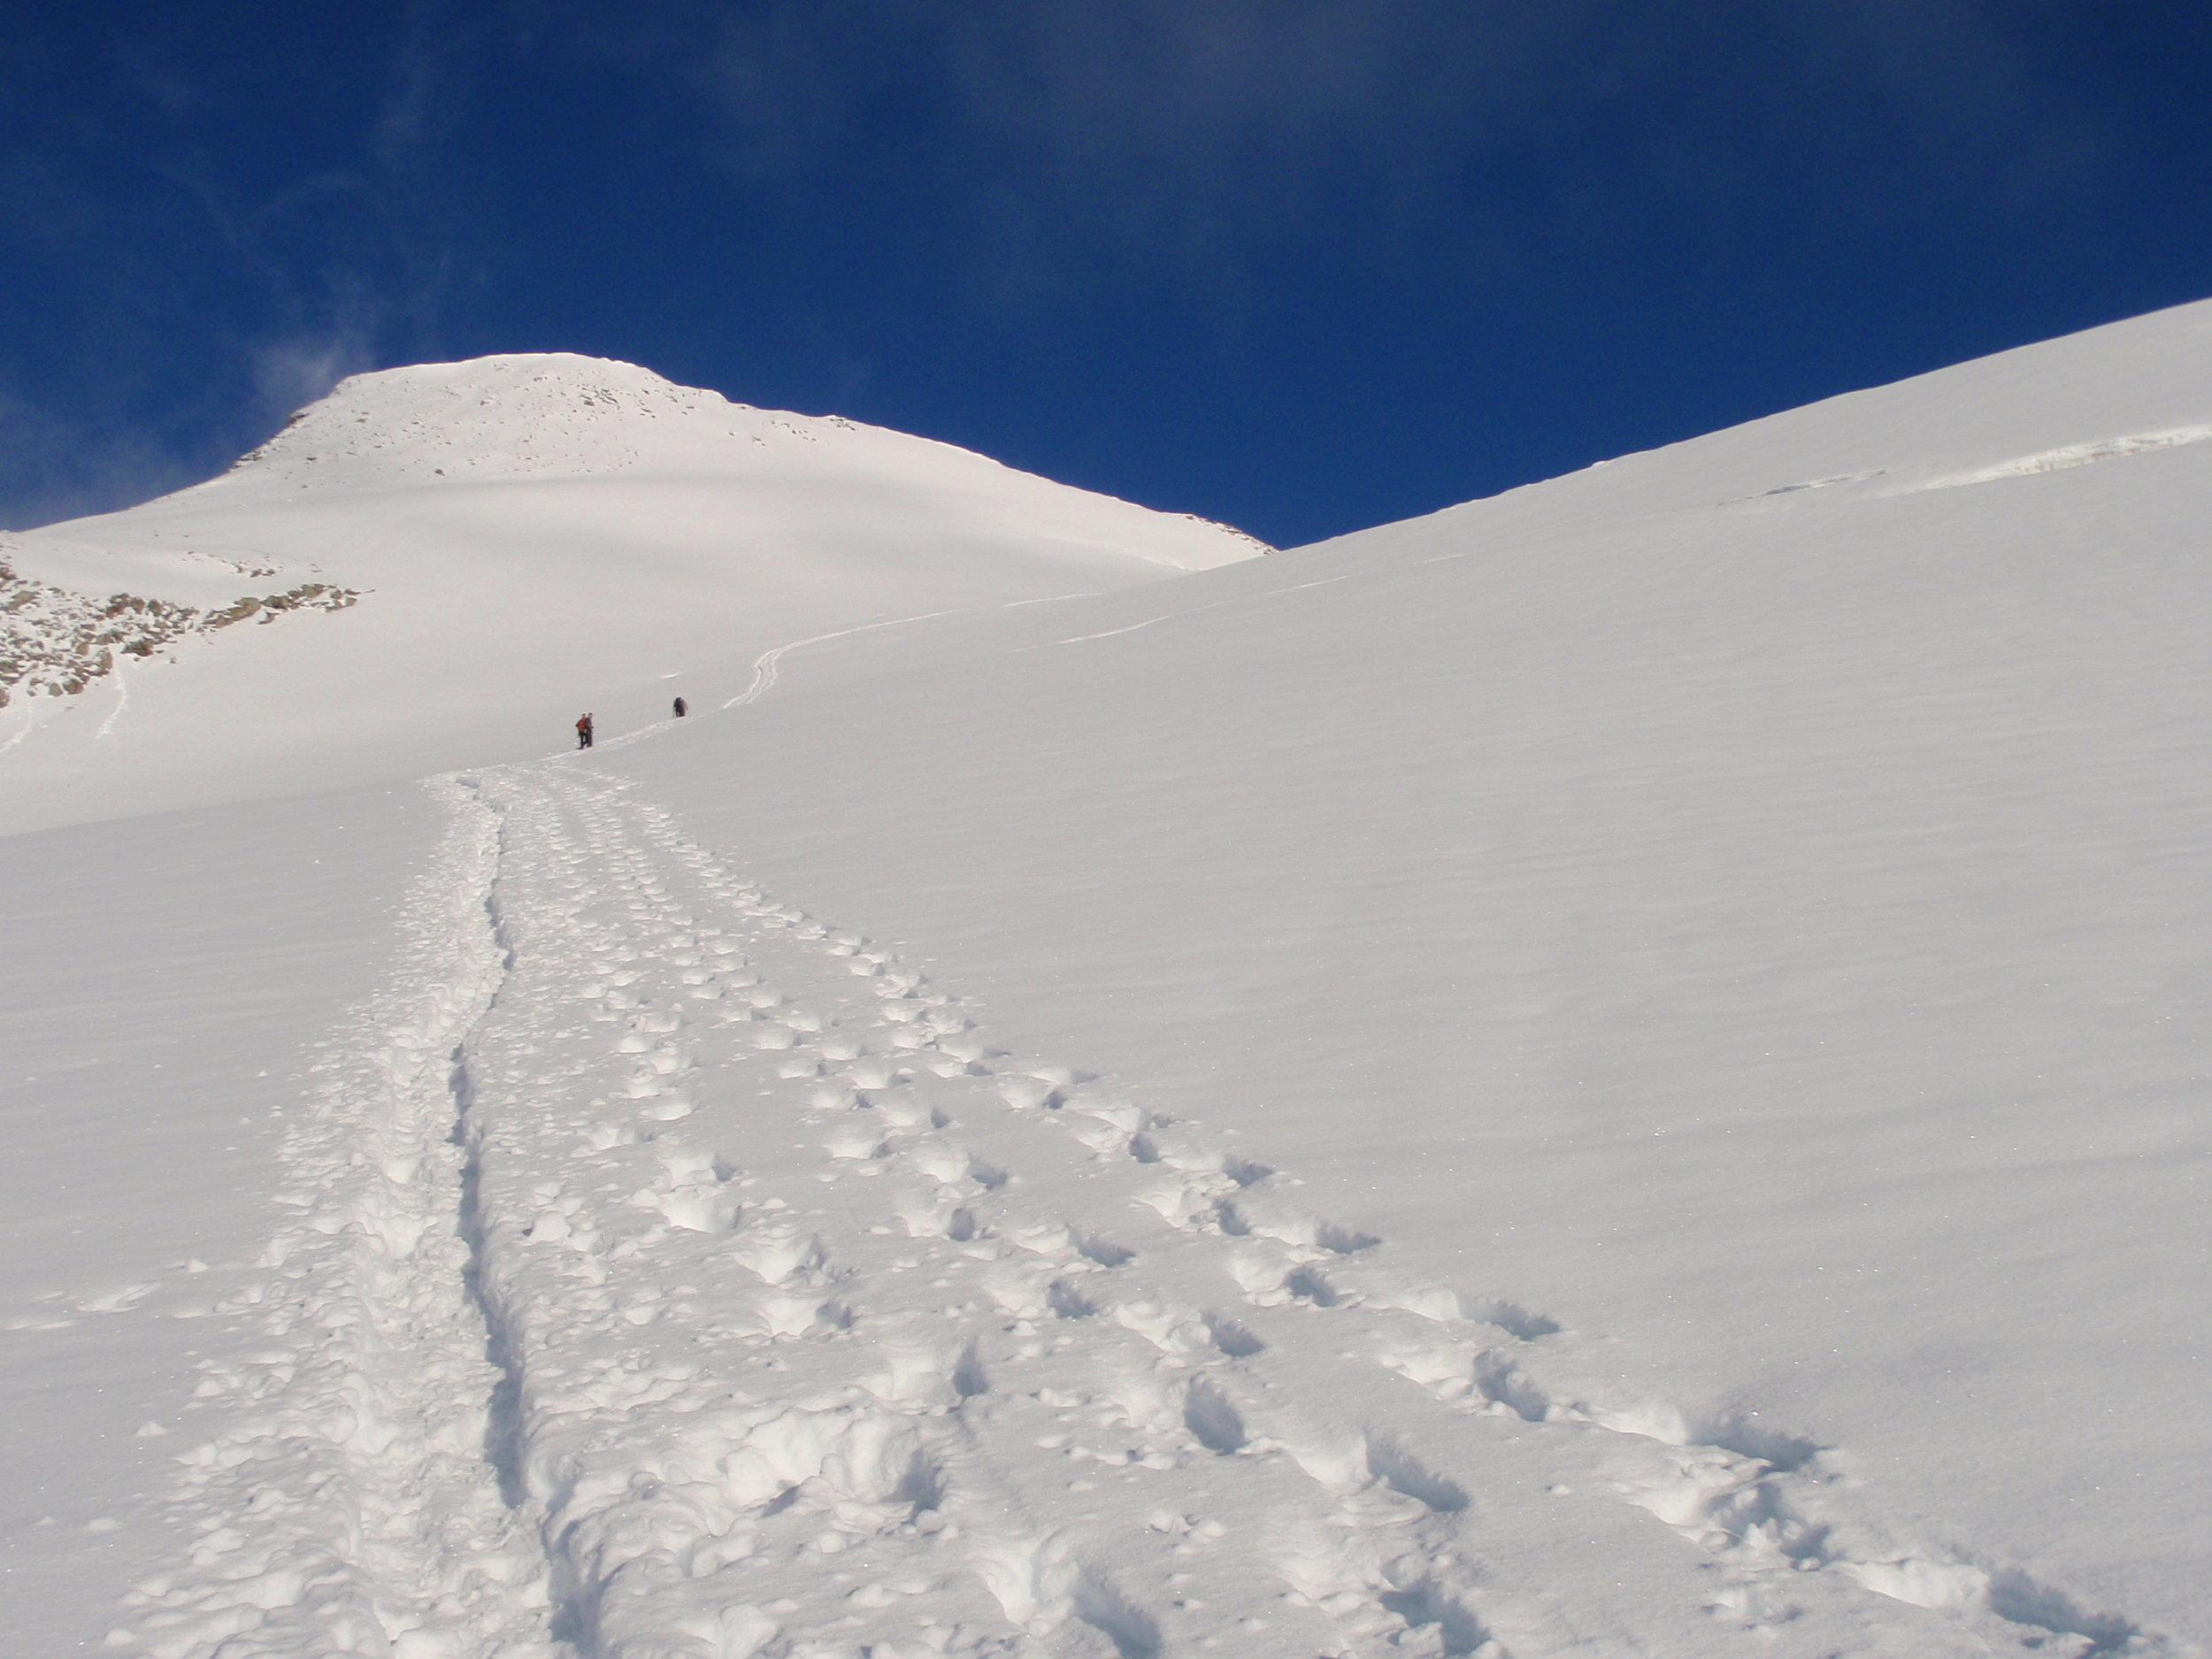 Snowshoe Footprints